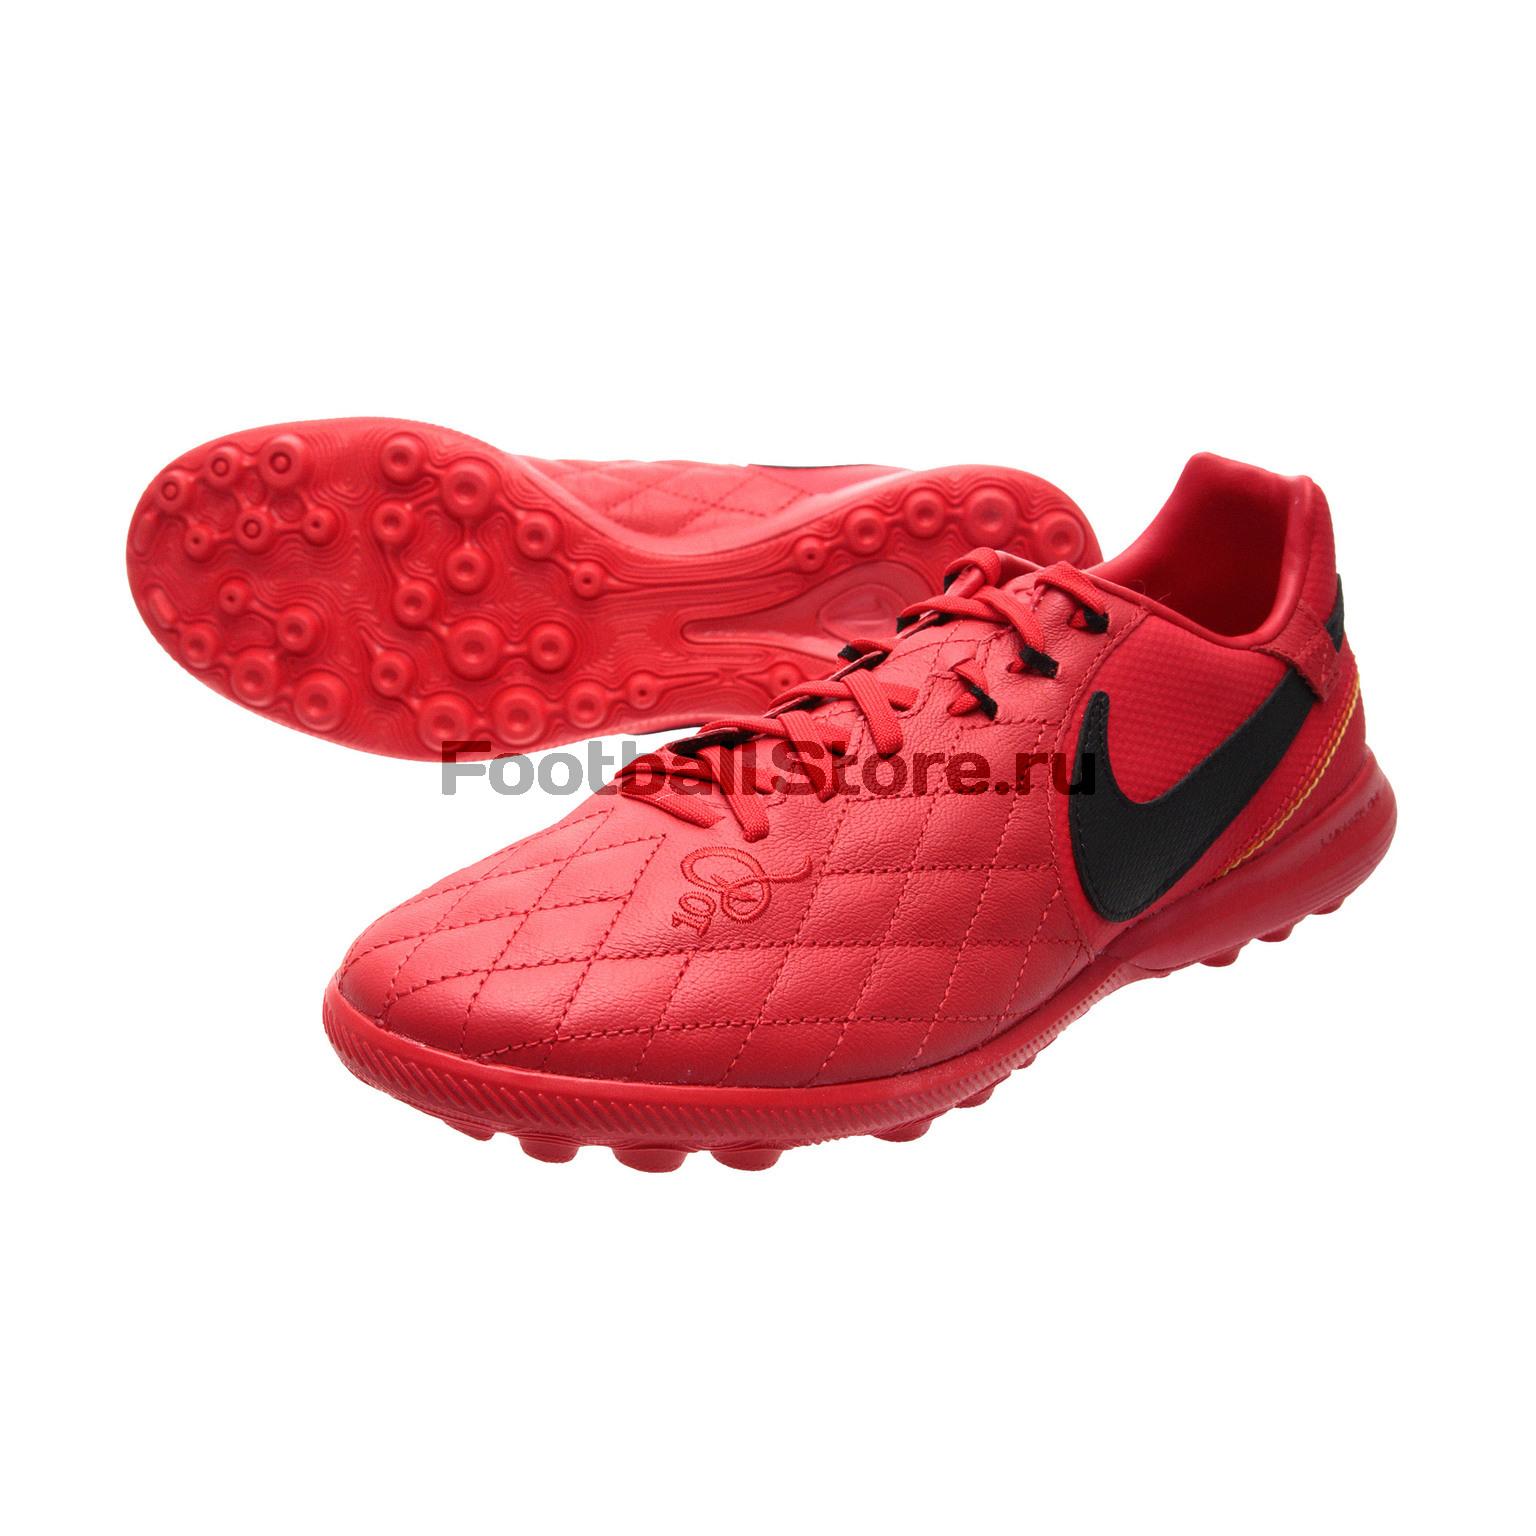 Шиповки Nike Ronaldinho Lunar Legend 7 Pro TF AQ2212-607 шиповки nike lunar legendx 7 pro tf ah7249 080